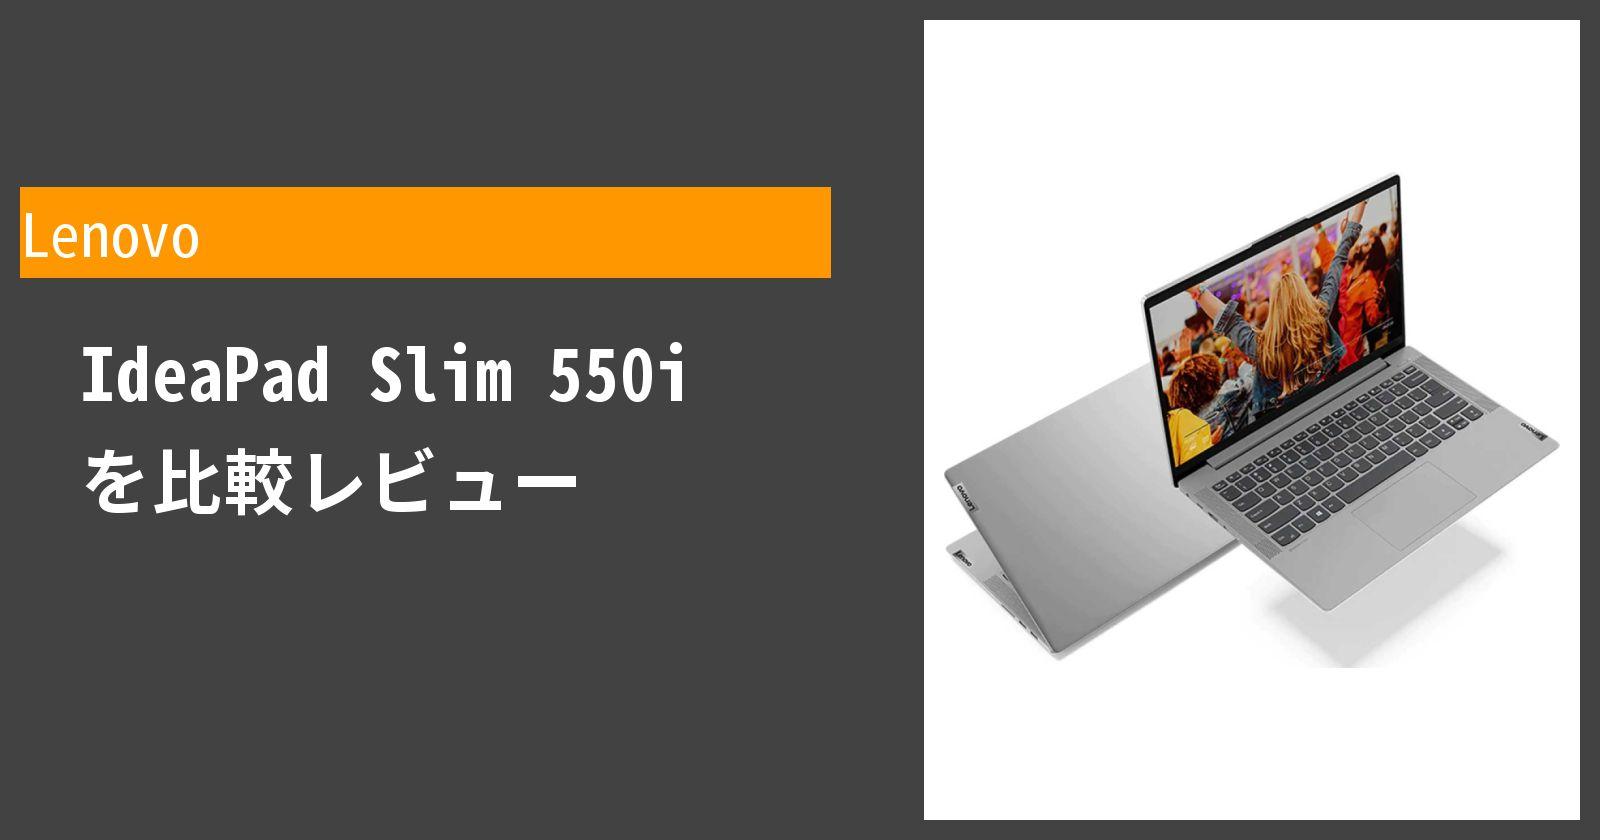 IdeaPad Slim 550iを徹底評価